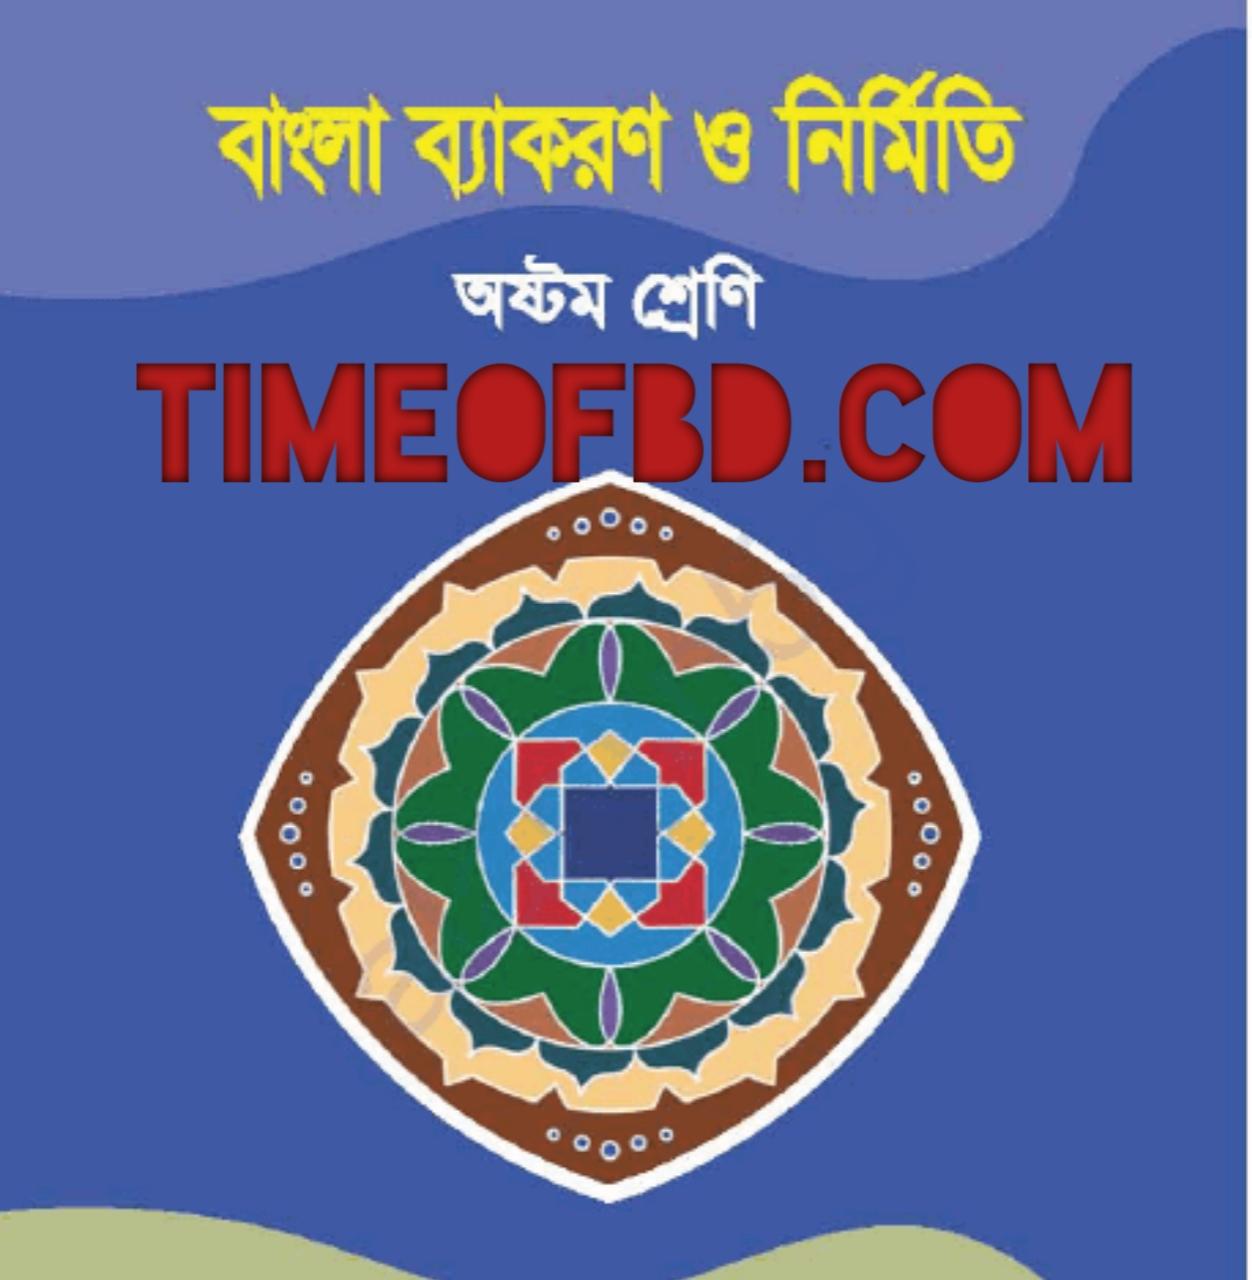 Class 8 bangla 2nd paper book 2021, class 8 bangla 2nd paper book pdf, class 8 bangla 2nd paper question, class 8 bangla 2nd paper boi, class 8 bangla 2nd paper book 2021, class 8 bangla 2nd paper book pdf, class 8 bangla 2nd paper book nctb, class 8 bangla 2nd paper guide 2021, class 8 bangla 2nd paper guide pdf, class 8 bangla 2nd paper note book 2021, class 8 bangla 2nd paper book pdf in Bengali, nctb book of class 8, class 8 bangla 2nd paper  book solution, class 8 guide book pdf, class 8 guide book pdf 2021, বাংলা দ্বিতীয় পত্র বই class 8, গণিত বই pdf, আমার ব্যাকরন বই অষ্টম শ্রেণি, অষ্টম শ্রেণীর ব্যাকরন বই ডাউনলোড, ব্যাকরন বই অষ্টম শ্রেণি, অষ্টম শ্রেণির ব্যাকরন বই ২০২১, অষ্টম শ্রেণীর ব্যাকরন বই পিডিএফ, অষ্টম শ্রেণির ব্যাকরন বই pdf 2021, অষ্টম শ্রেণীর ব্যাকরন গাইড, অষ্টম শ্রেণীর ব্যাকরন গাইড পিডিএফ, অষ্টম শ্রেণীর ব্যাকরণ গাইড pdf 2021, অষ্টম শ্রেণীর ব্যাকরন বই গাইড, অষ্টম শ্রেণীর বাংলা দ্বিতীয় পত্র গাইড ডাউনলোড, আমার ব্যাকরন বই অষ্টম শ্রেণি,